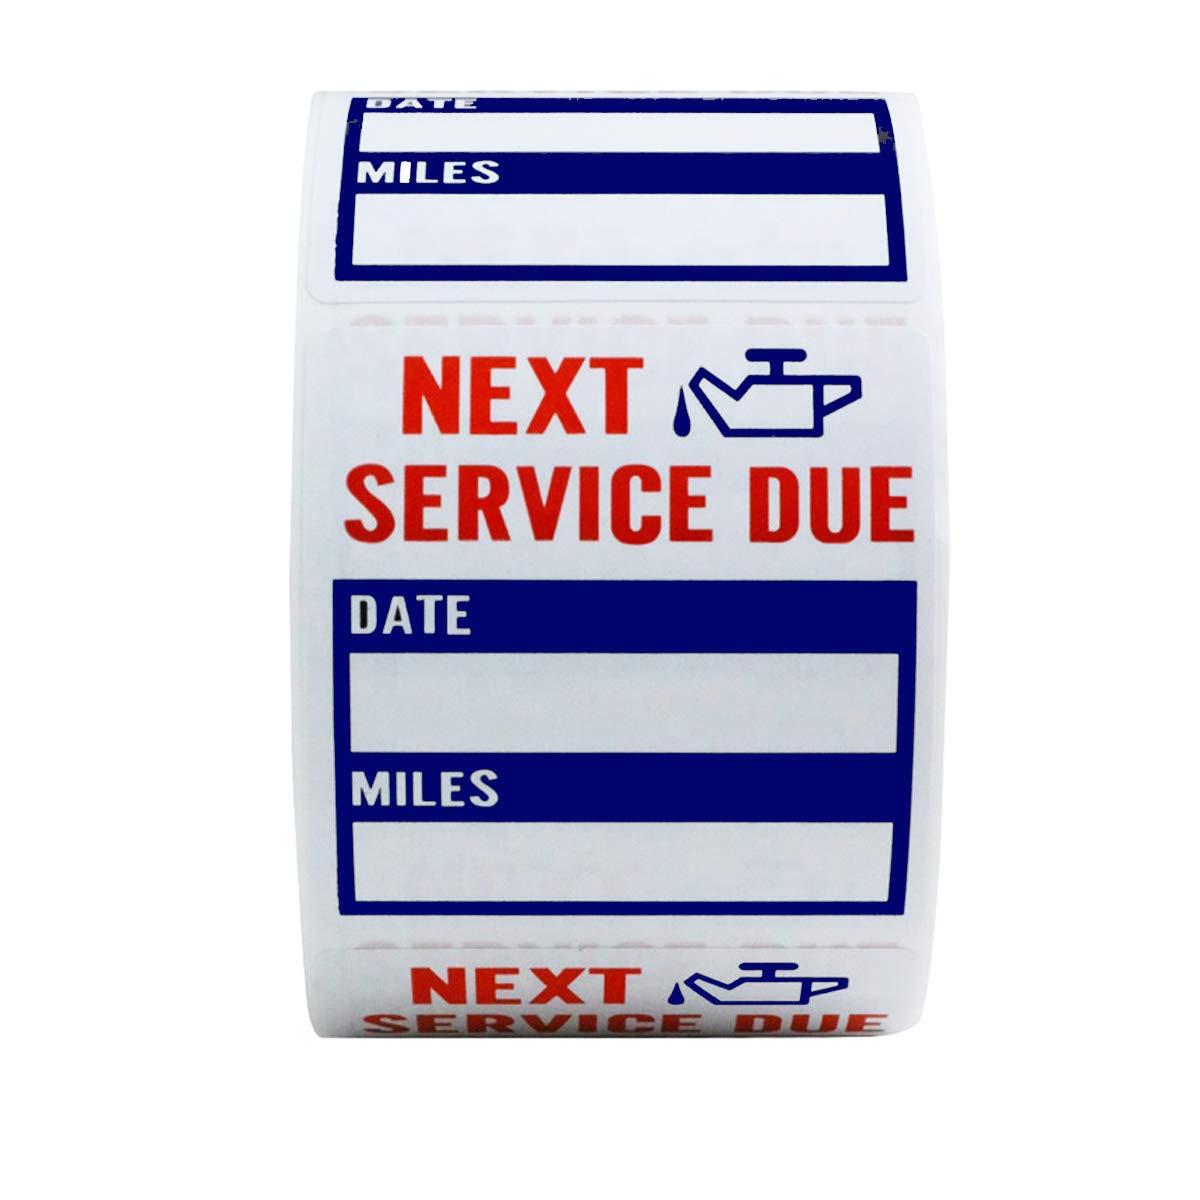 Oil Change Service Reminder, Window Sticker, 100 Count , Color Choice Blue